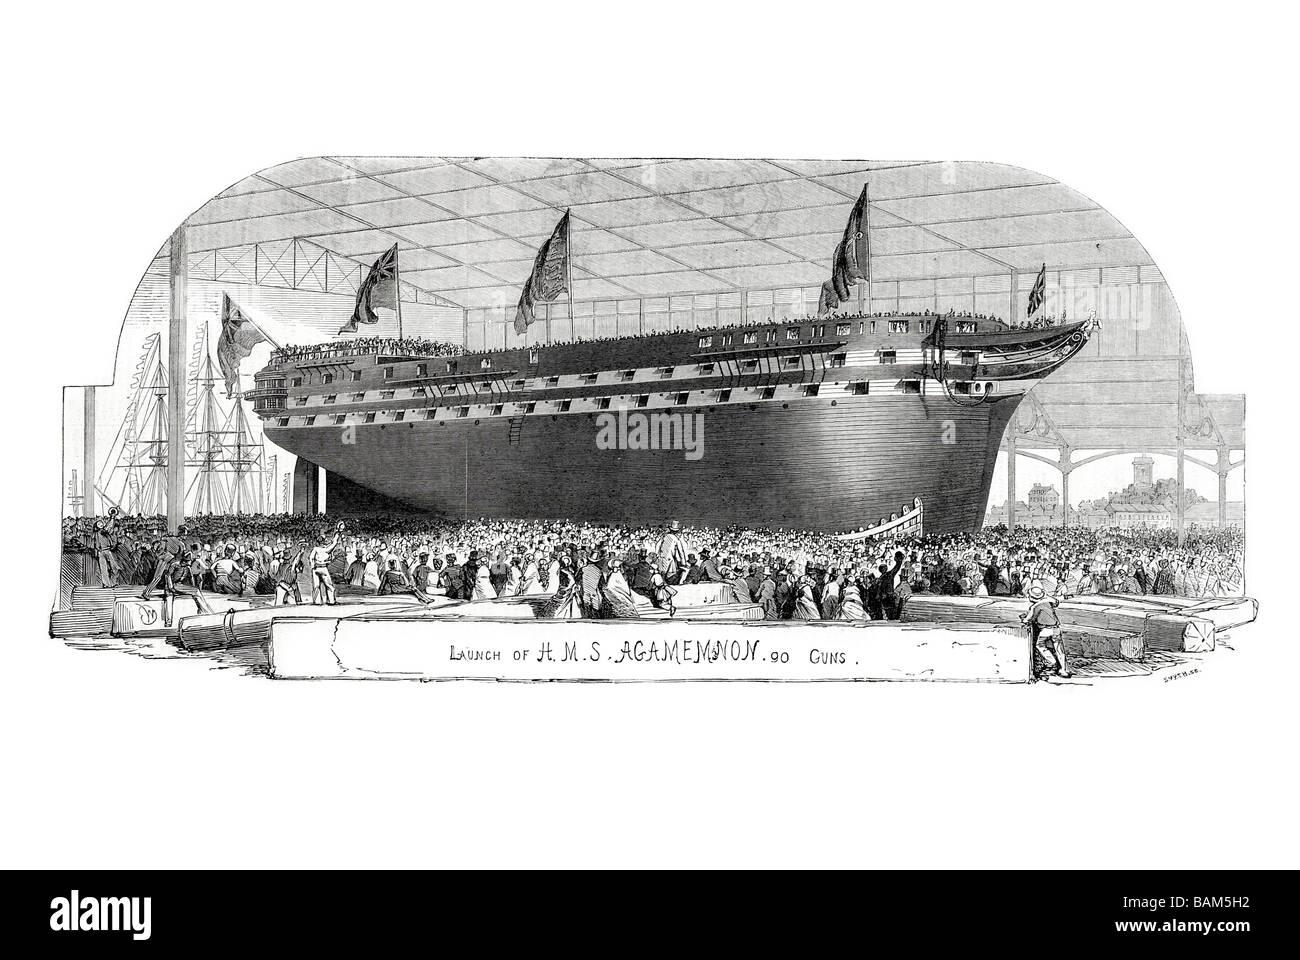 launch of h m s agamemnon 91 guns 1852 Royal Navy battleship ancillary steam power - Stock Image